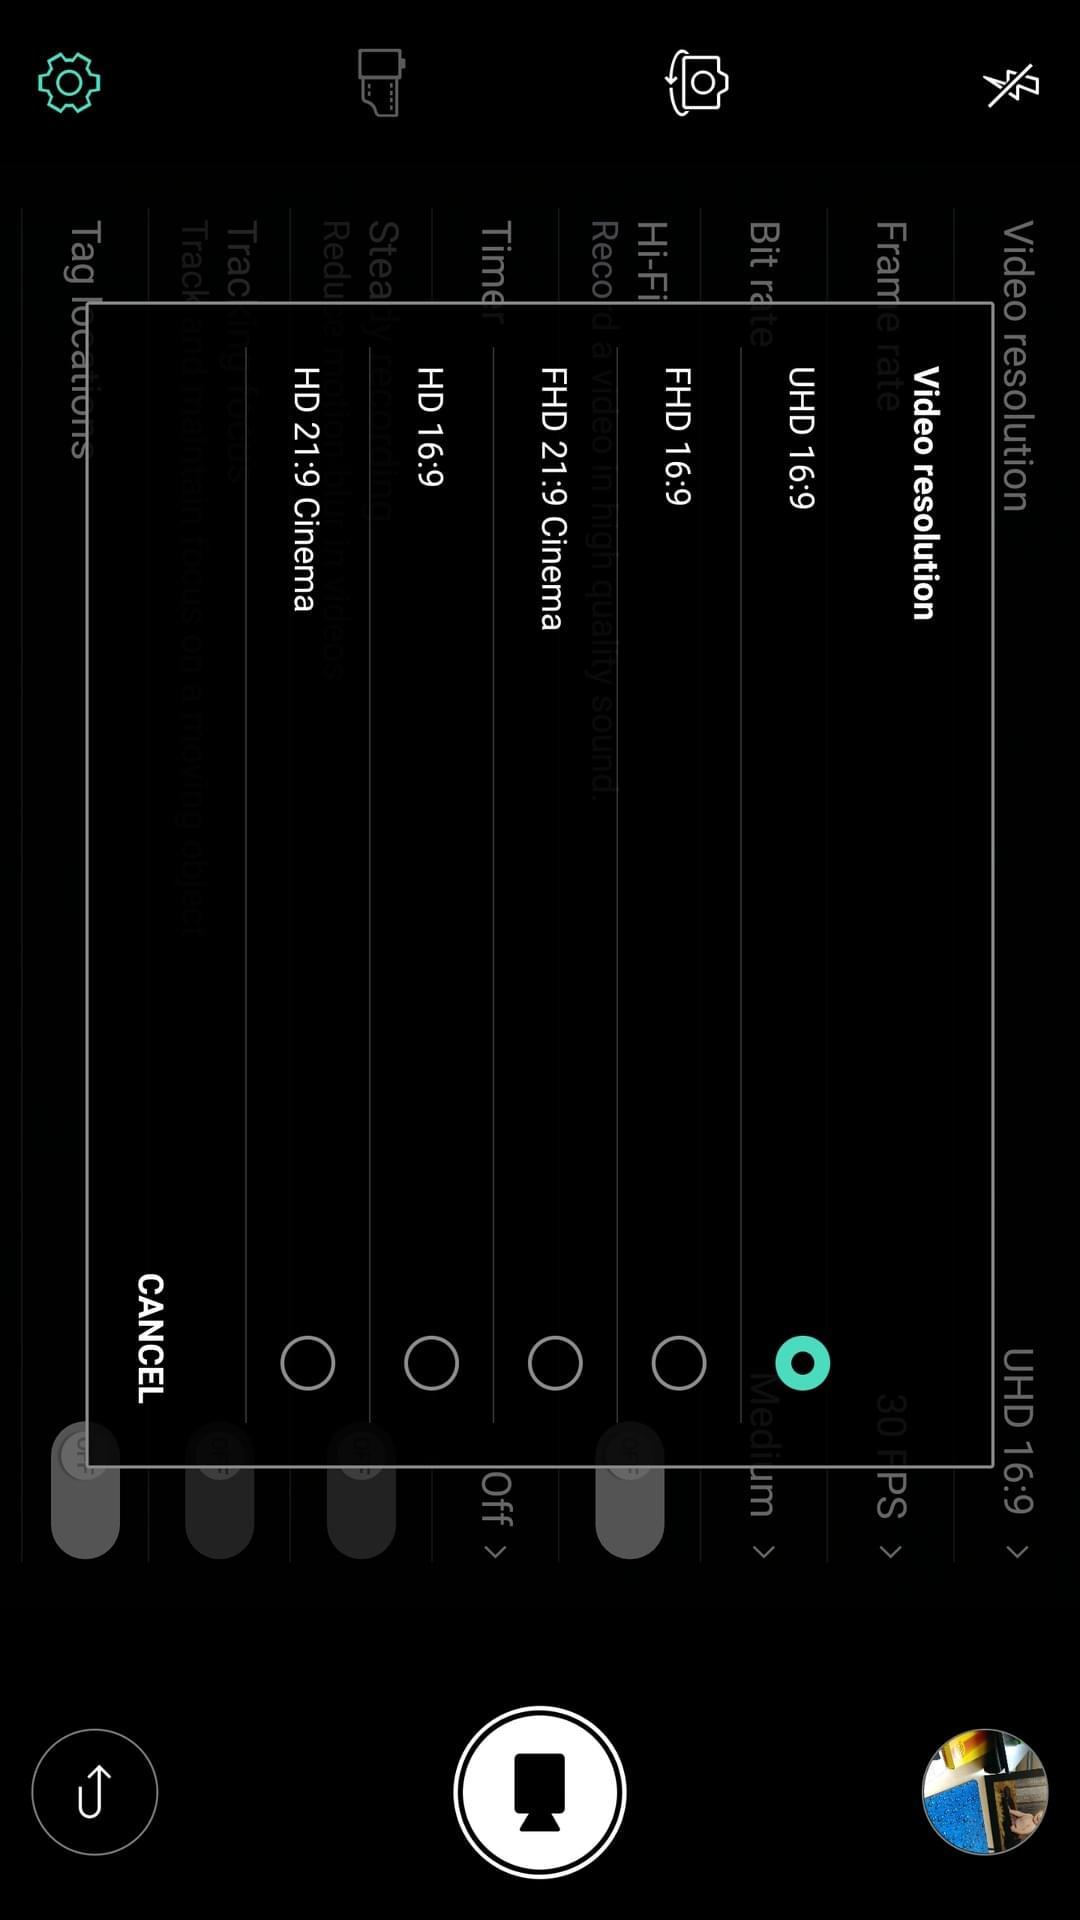 LG V20 AH NS screenshots camera manual video options